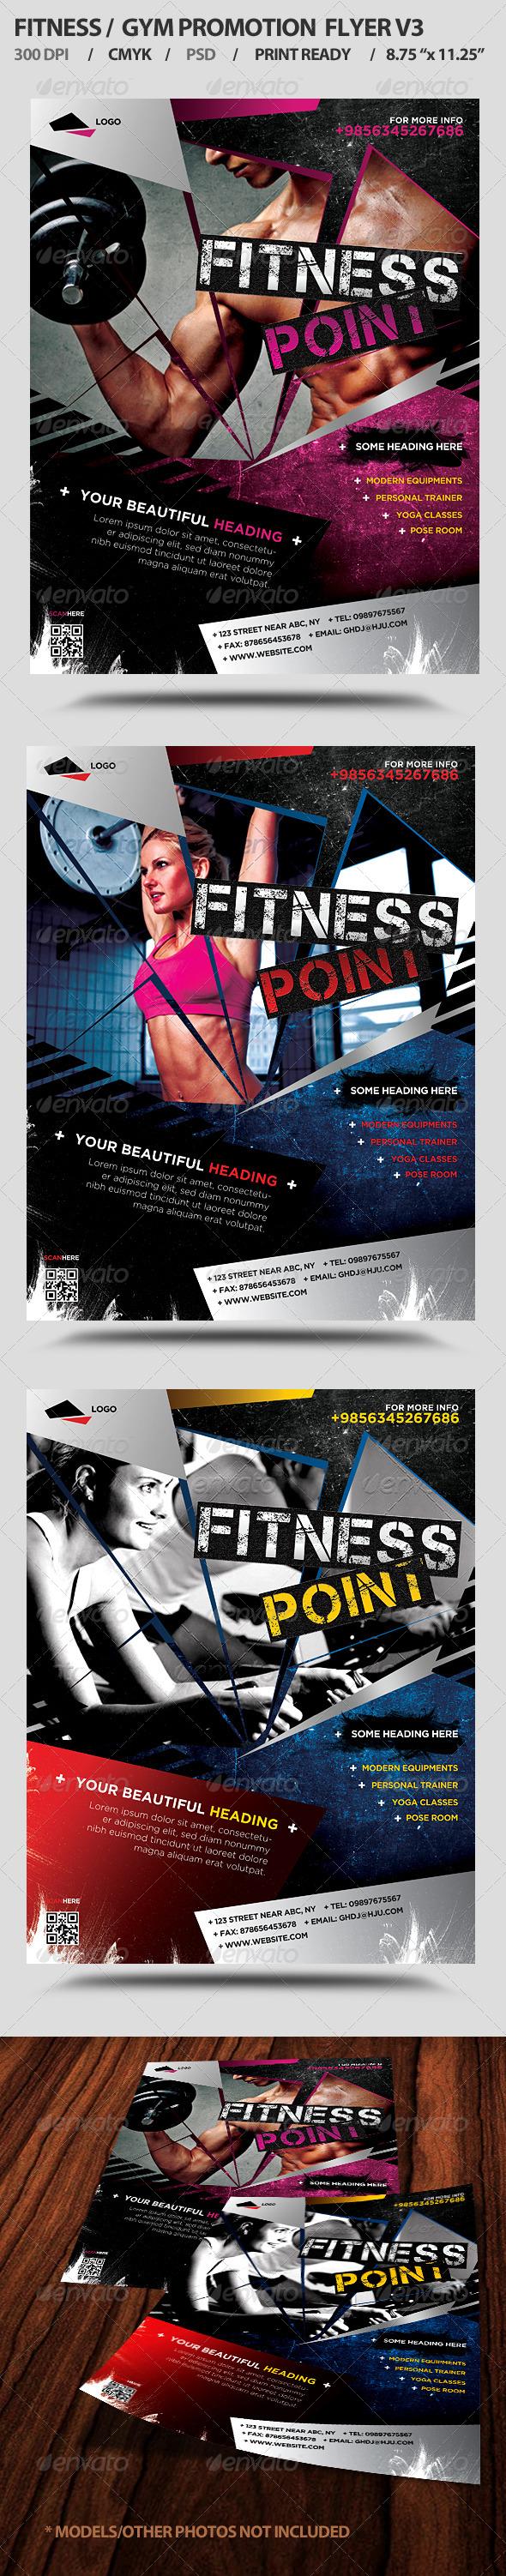 Fitness/Gym Business Promotion Flyer V3 - Sports Events